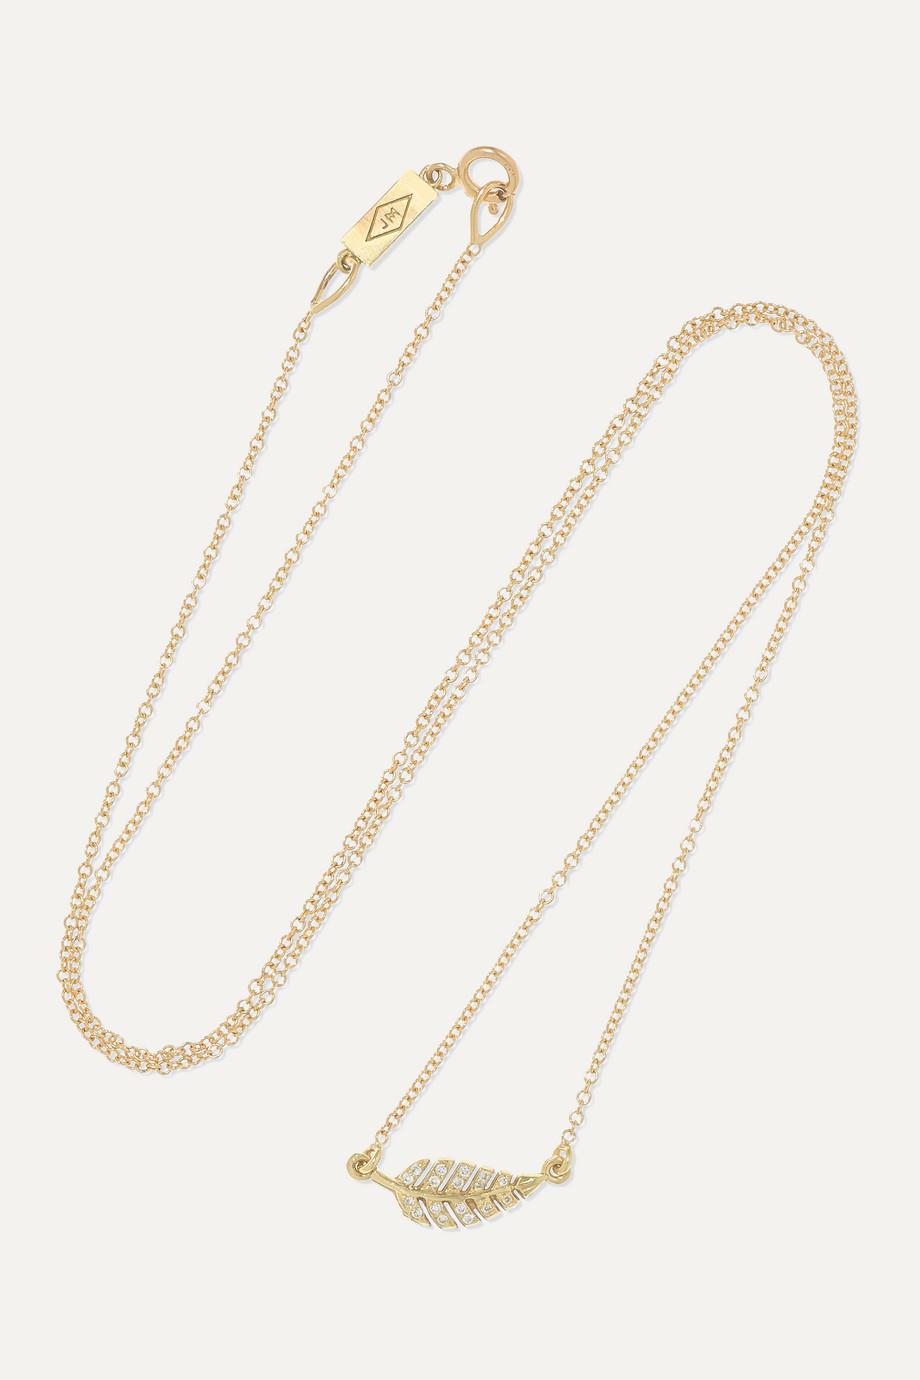 Jennifer Meyer Collier en or 18 carats et diamants Mini Leaf